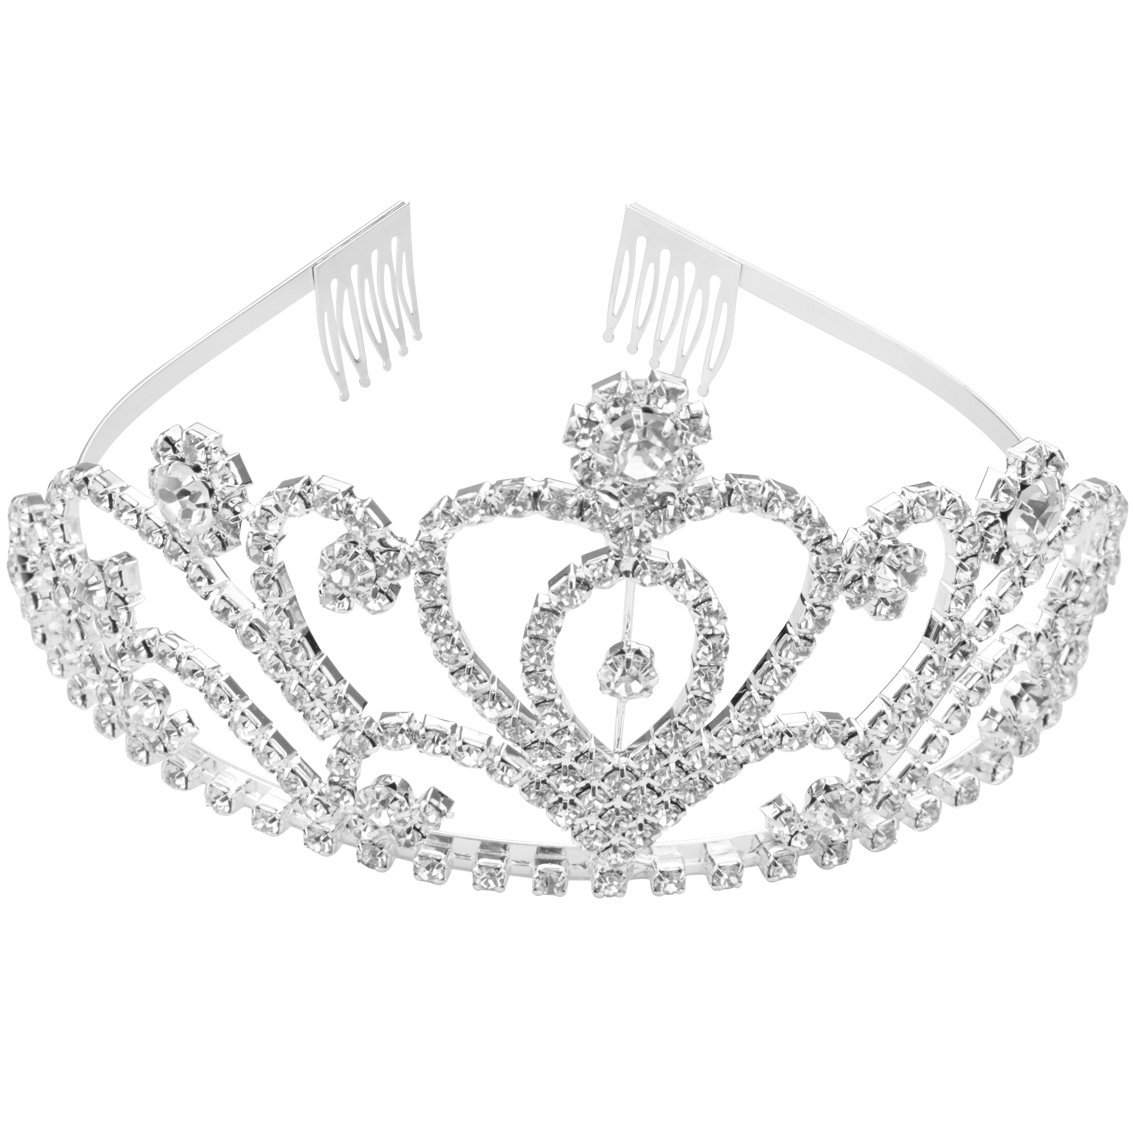 SUMERSHA Wedding Tiara with Comb Bridal Shining Rhinestones Crystal Headband Pageant Princess Bridal Prom Decoration Party Wear